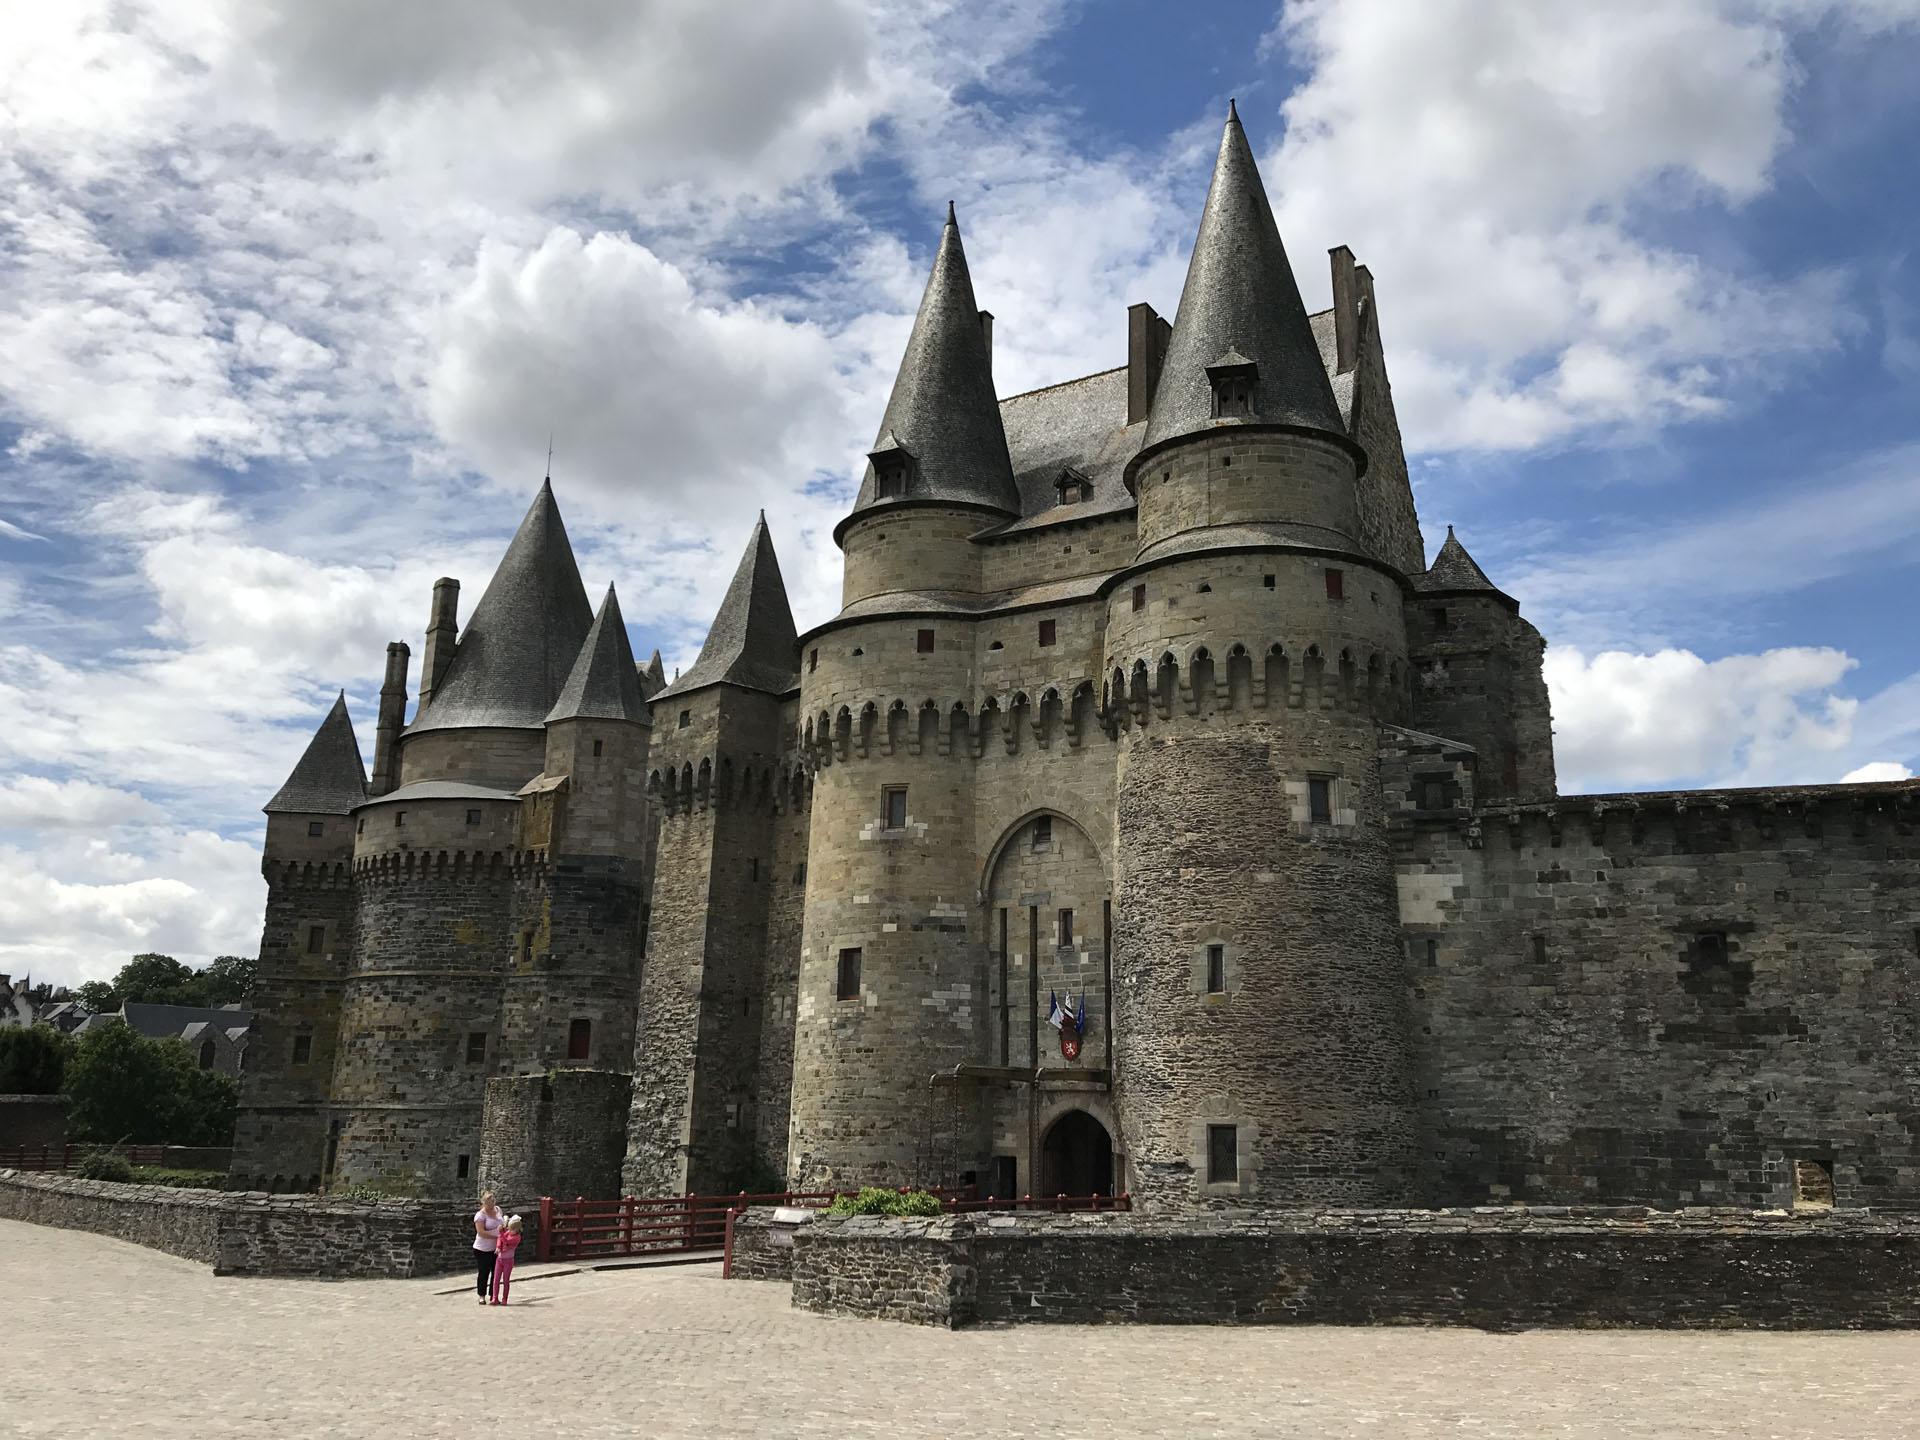 ヴィトレ城(Château de Vitré)